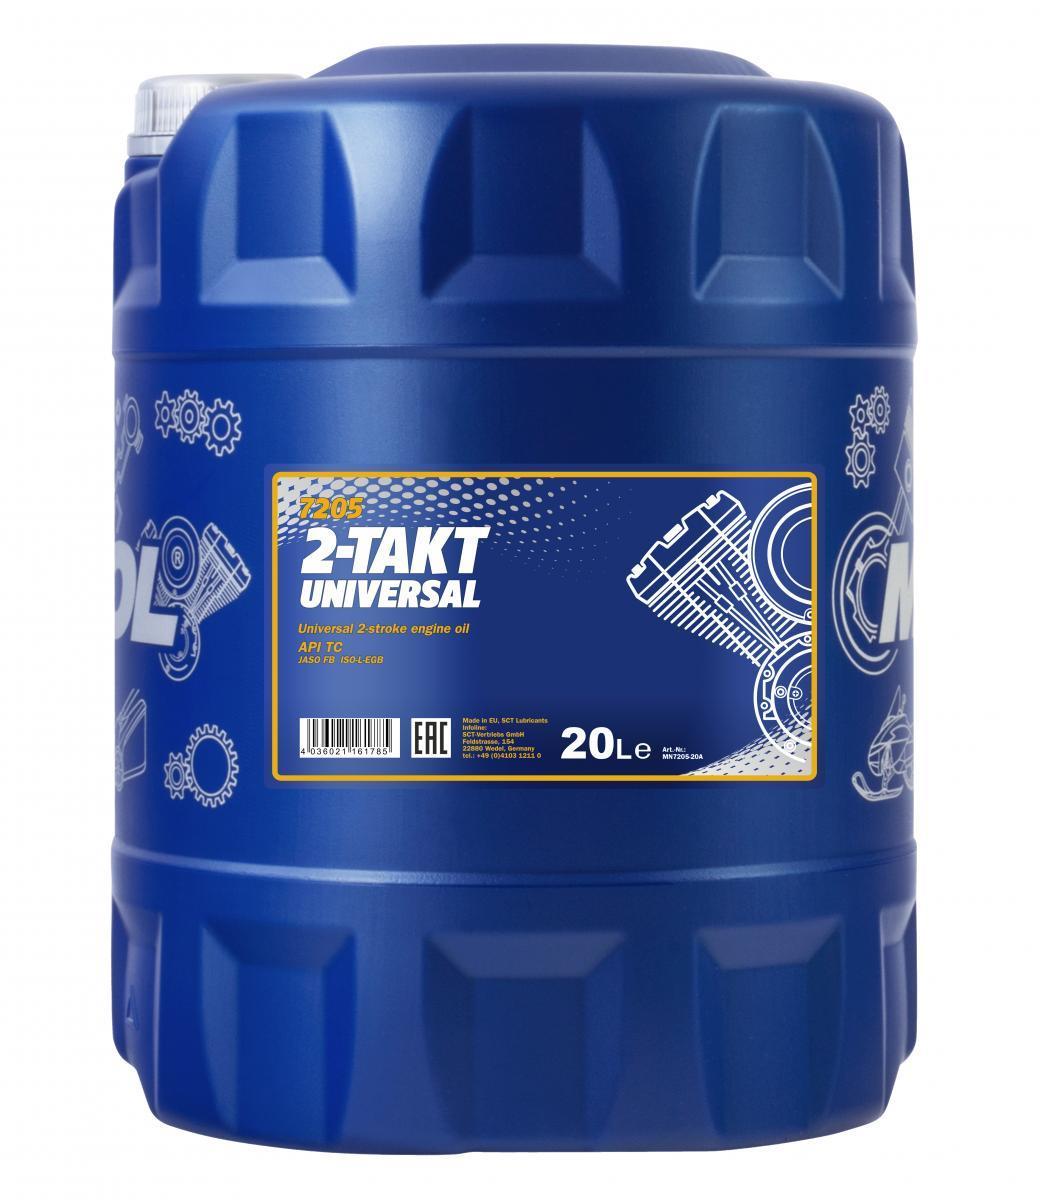 Motorolie MN7205-20 med en rabat — køb nu!